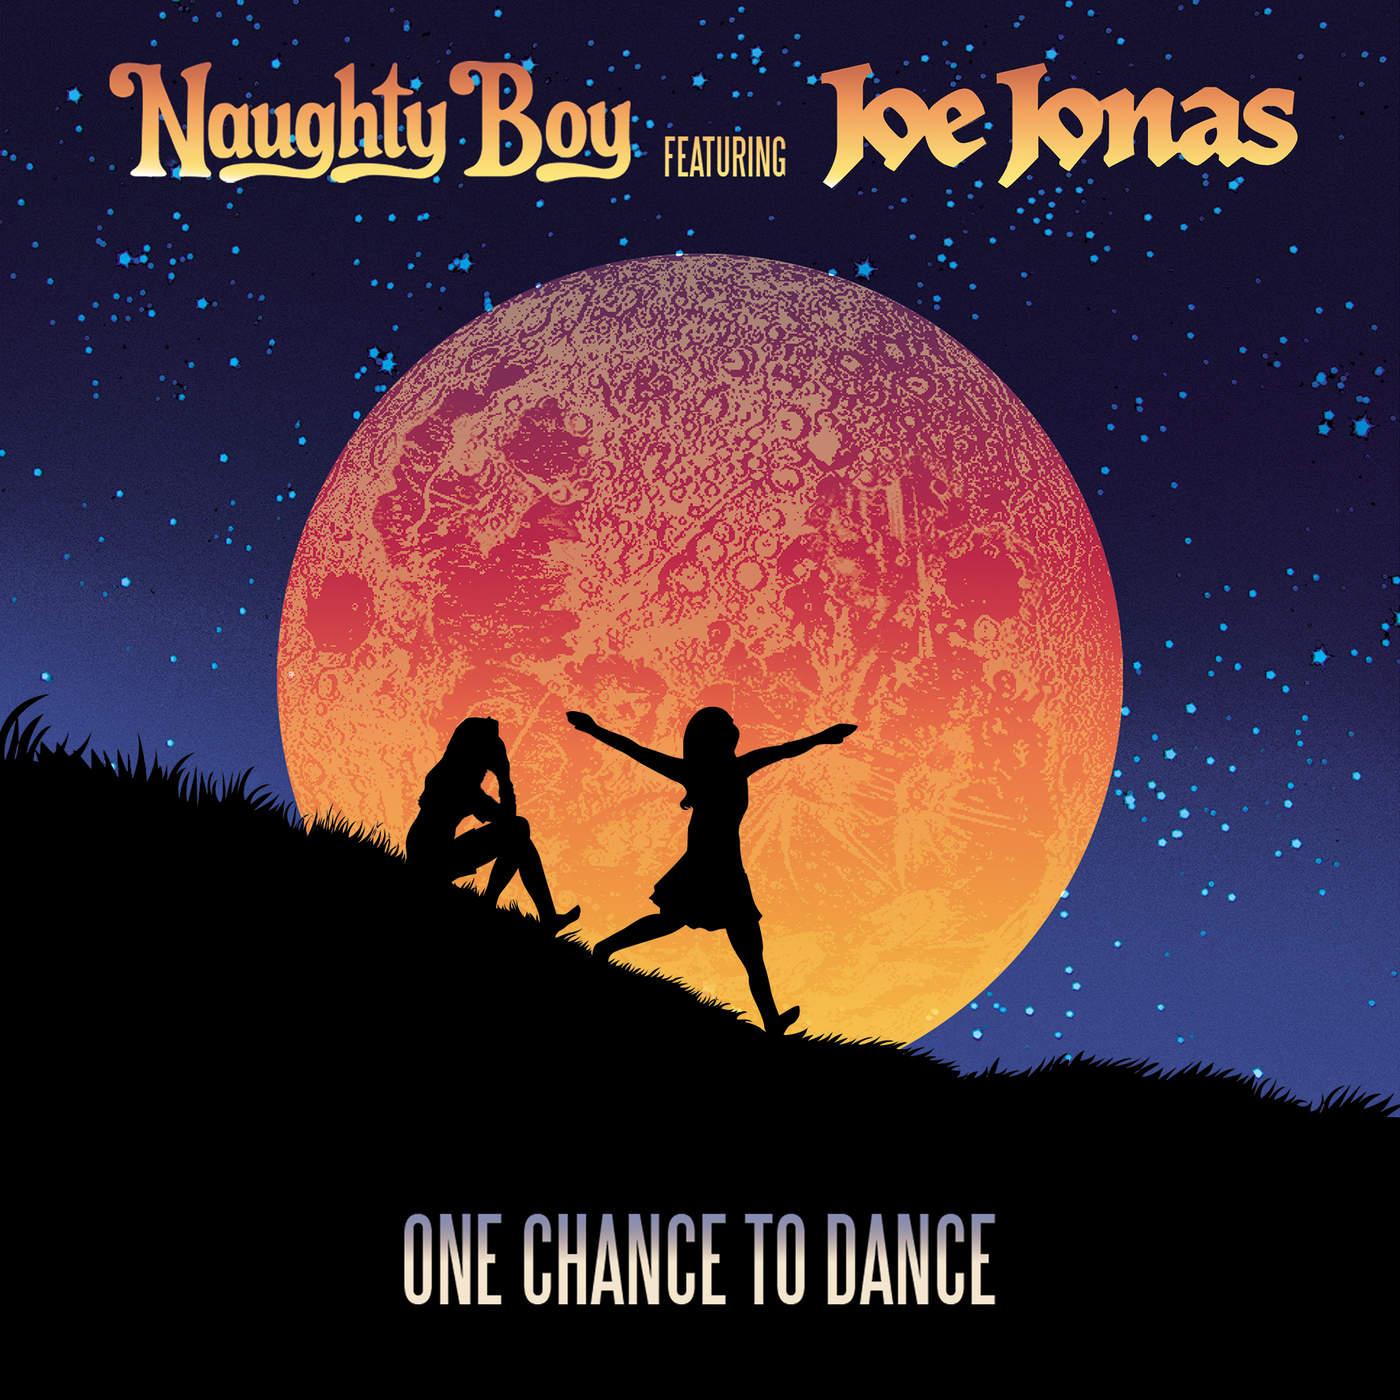 Naughty Boy - One Chance to Dance (feat. Joe Jonas) - Single